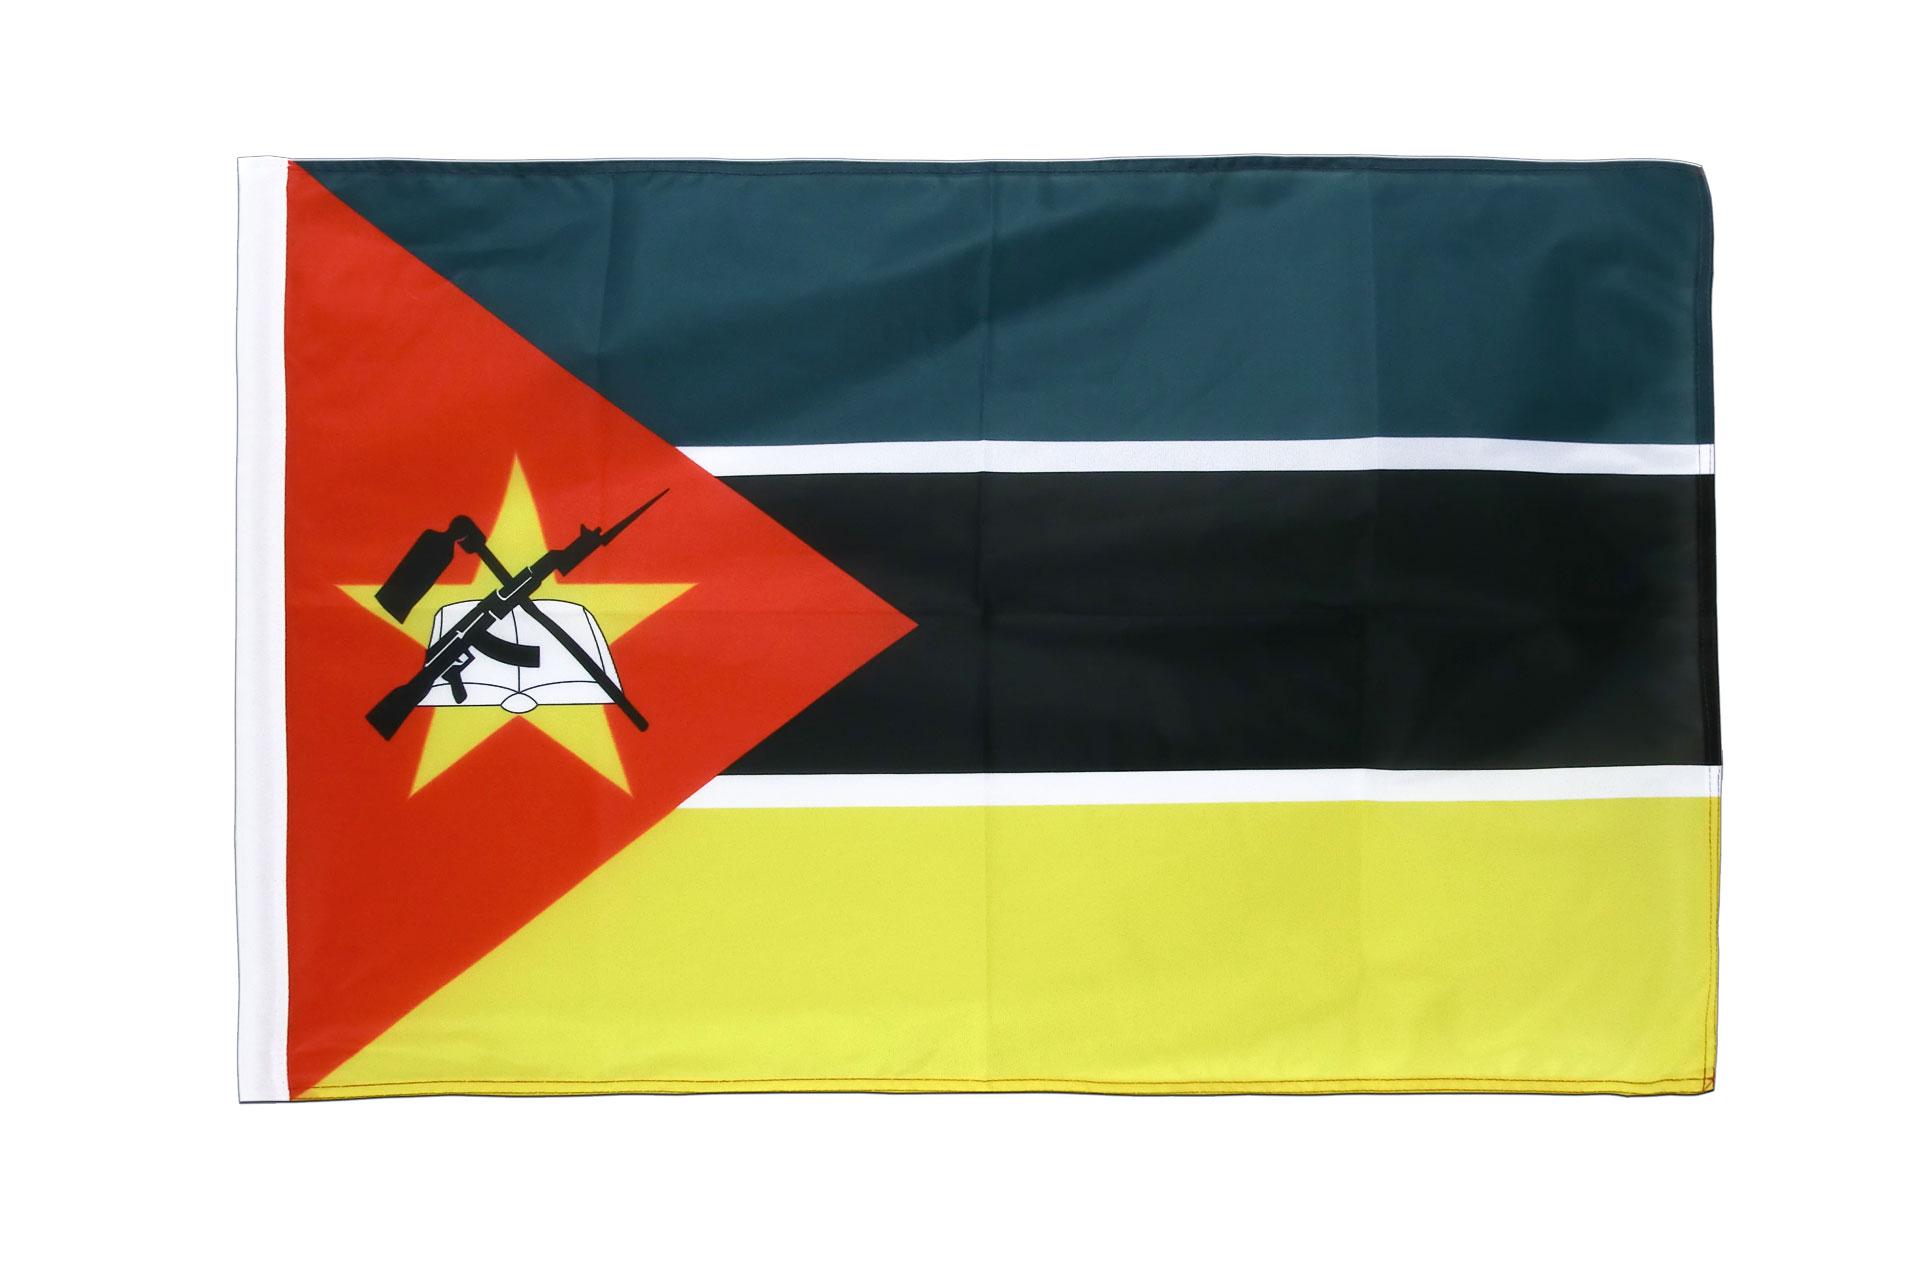 90 x 150 cm Hissflagge Fahne Flagge Tansania